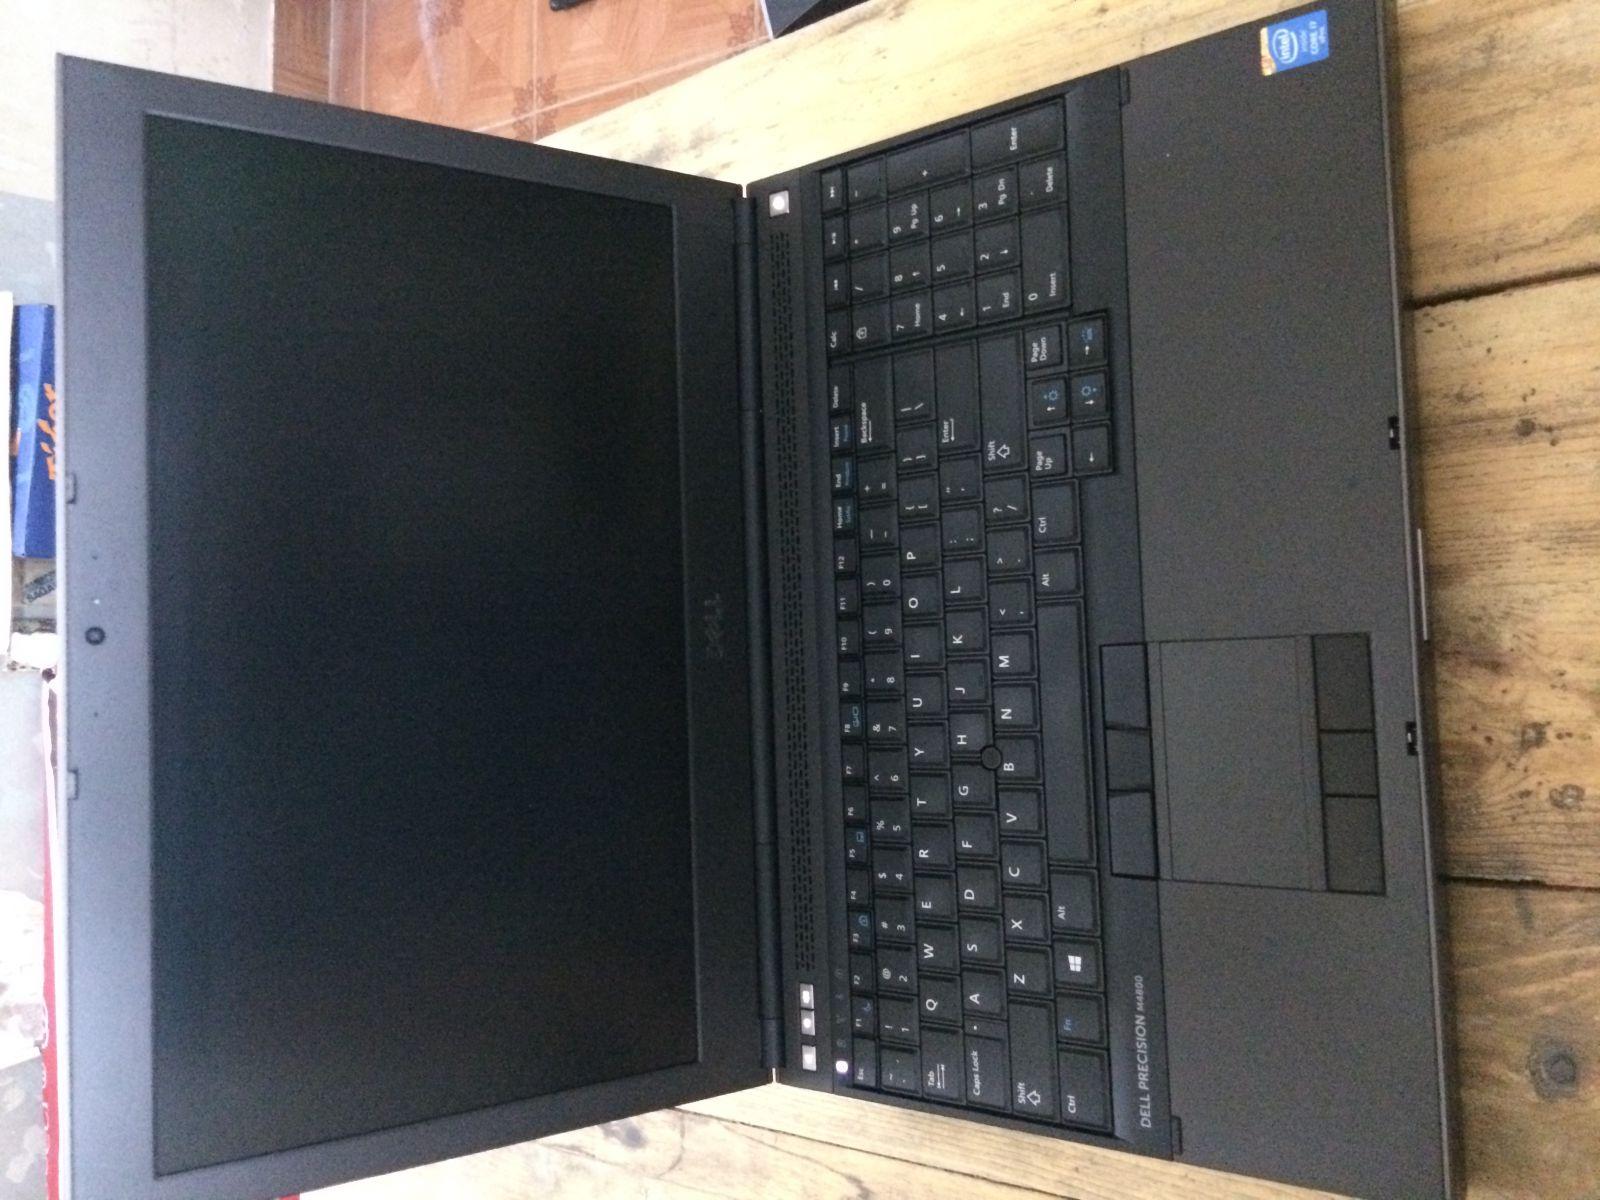 Dell Precision M4800 (Core I7, Ram 8GB, SSD 200GB, VGA RỜI K100M, Màn hình full HD)